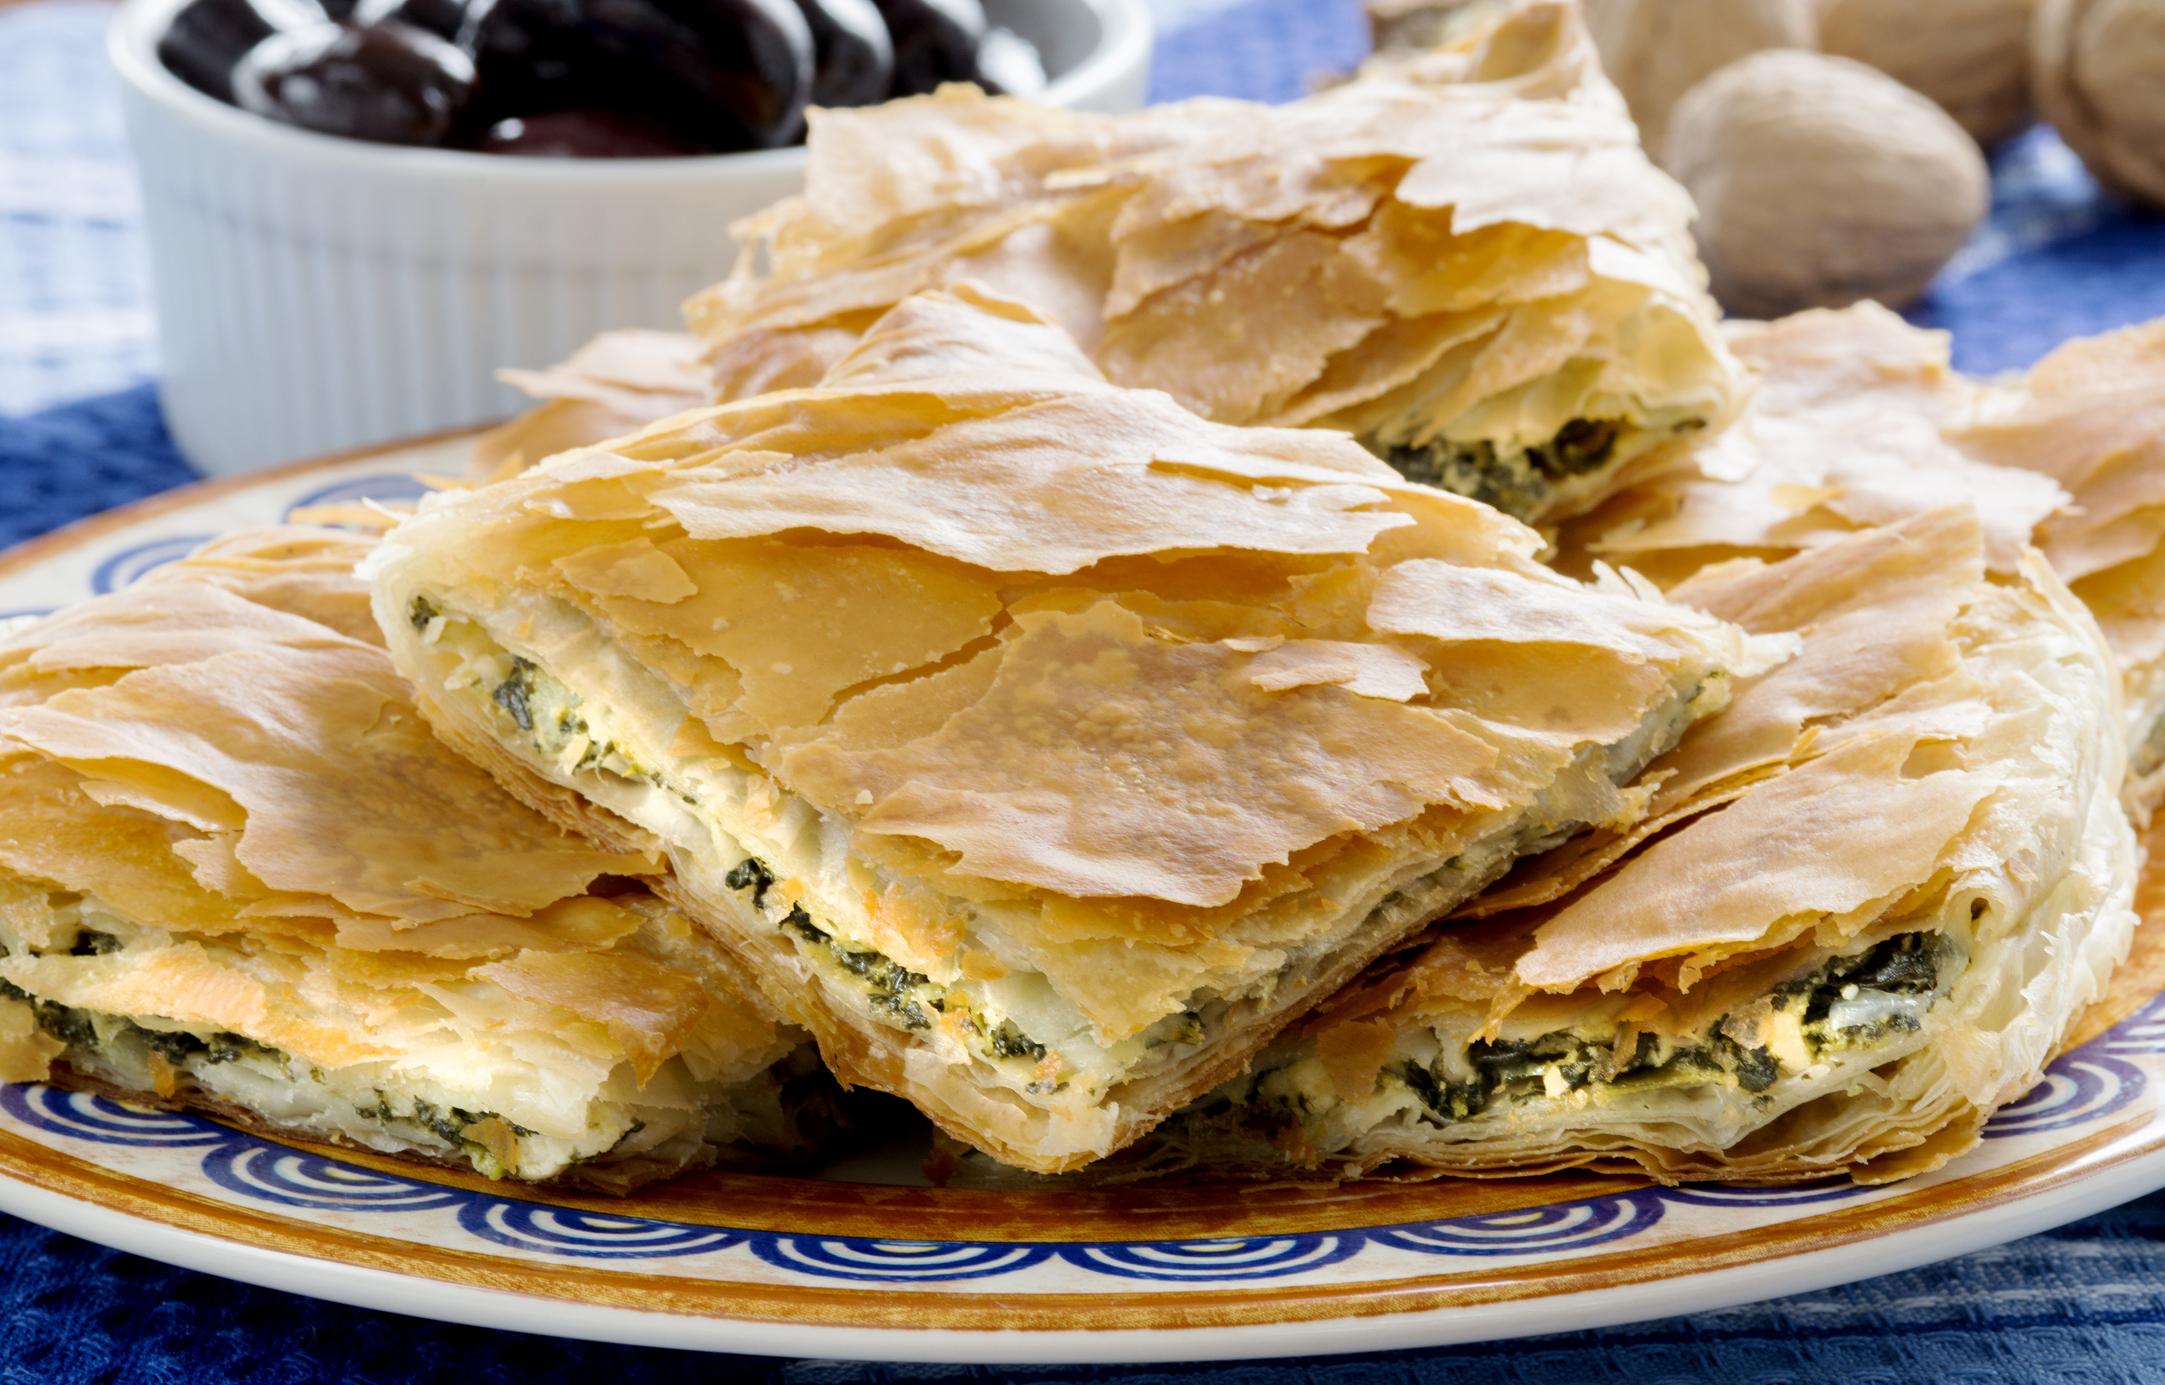 Spanakopita - a Recipe in the Style of KouZina Greek Street Food